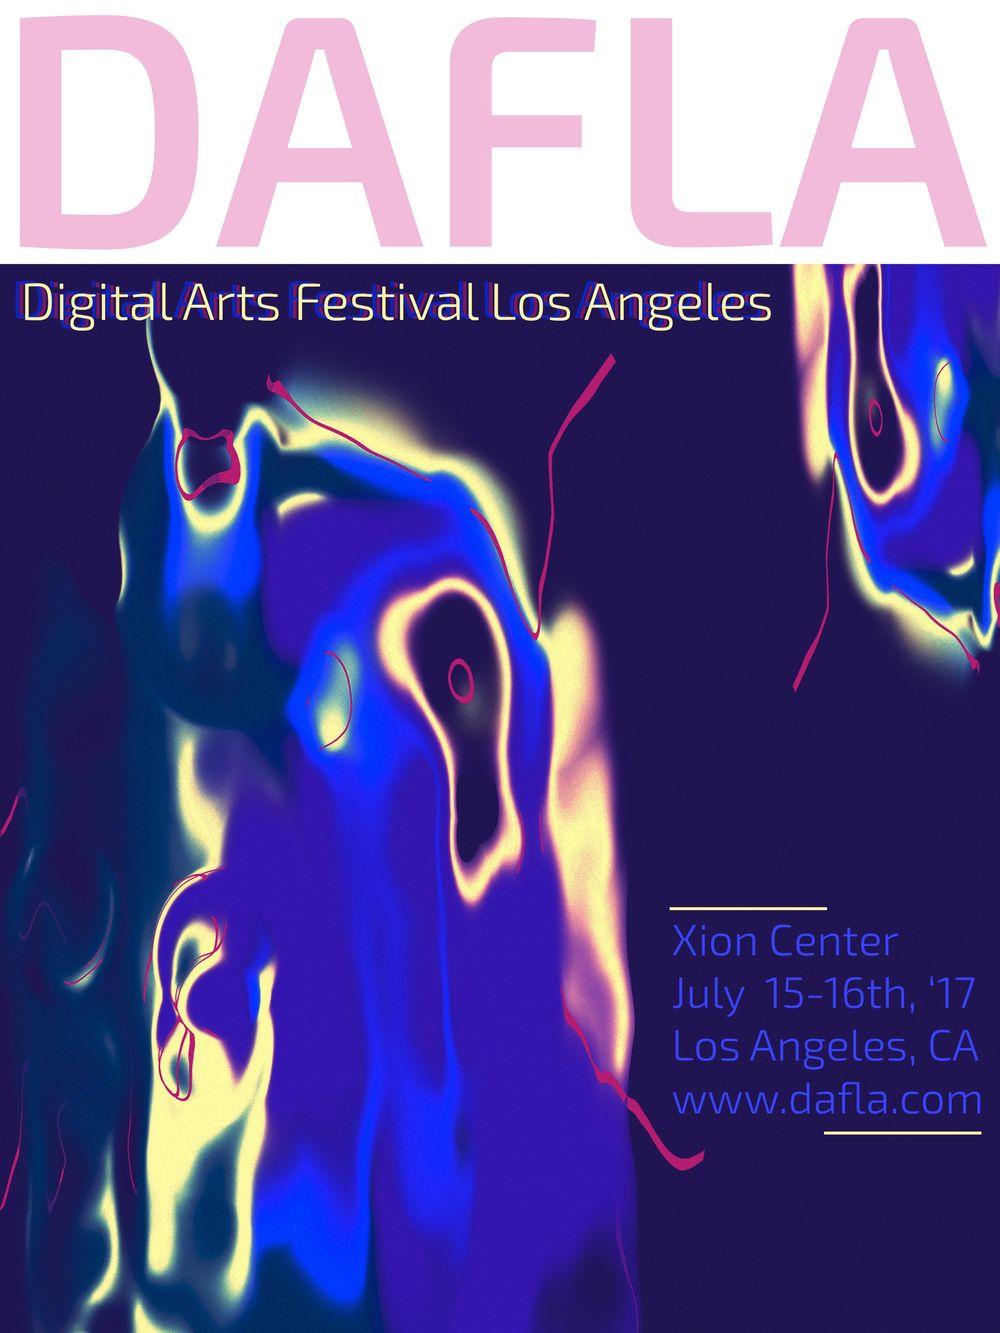 Digital Arts Festival Poster - image 1 - student project